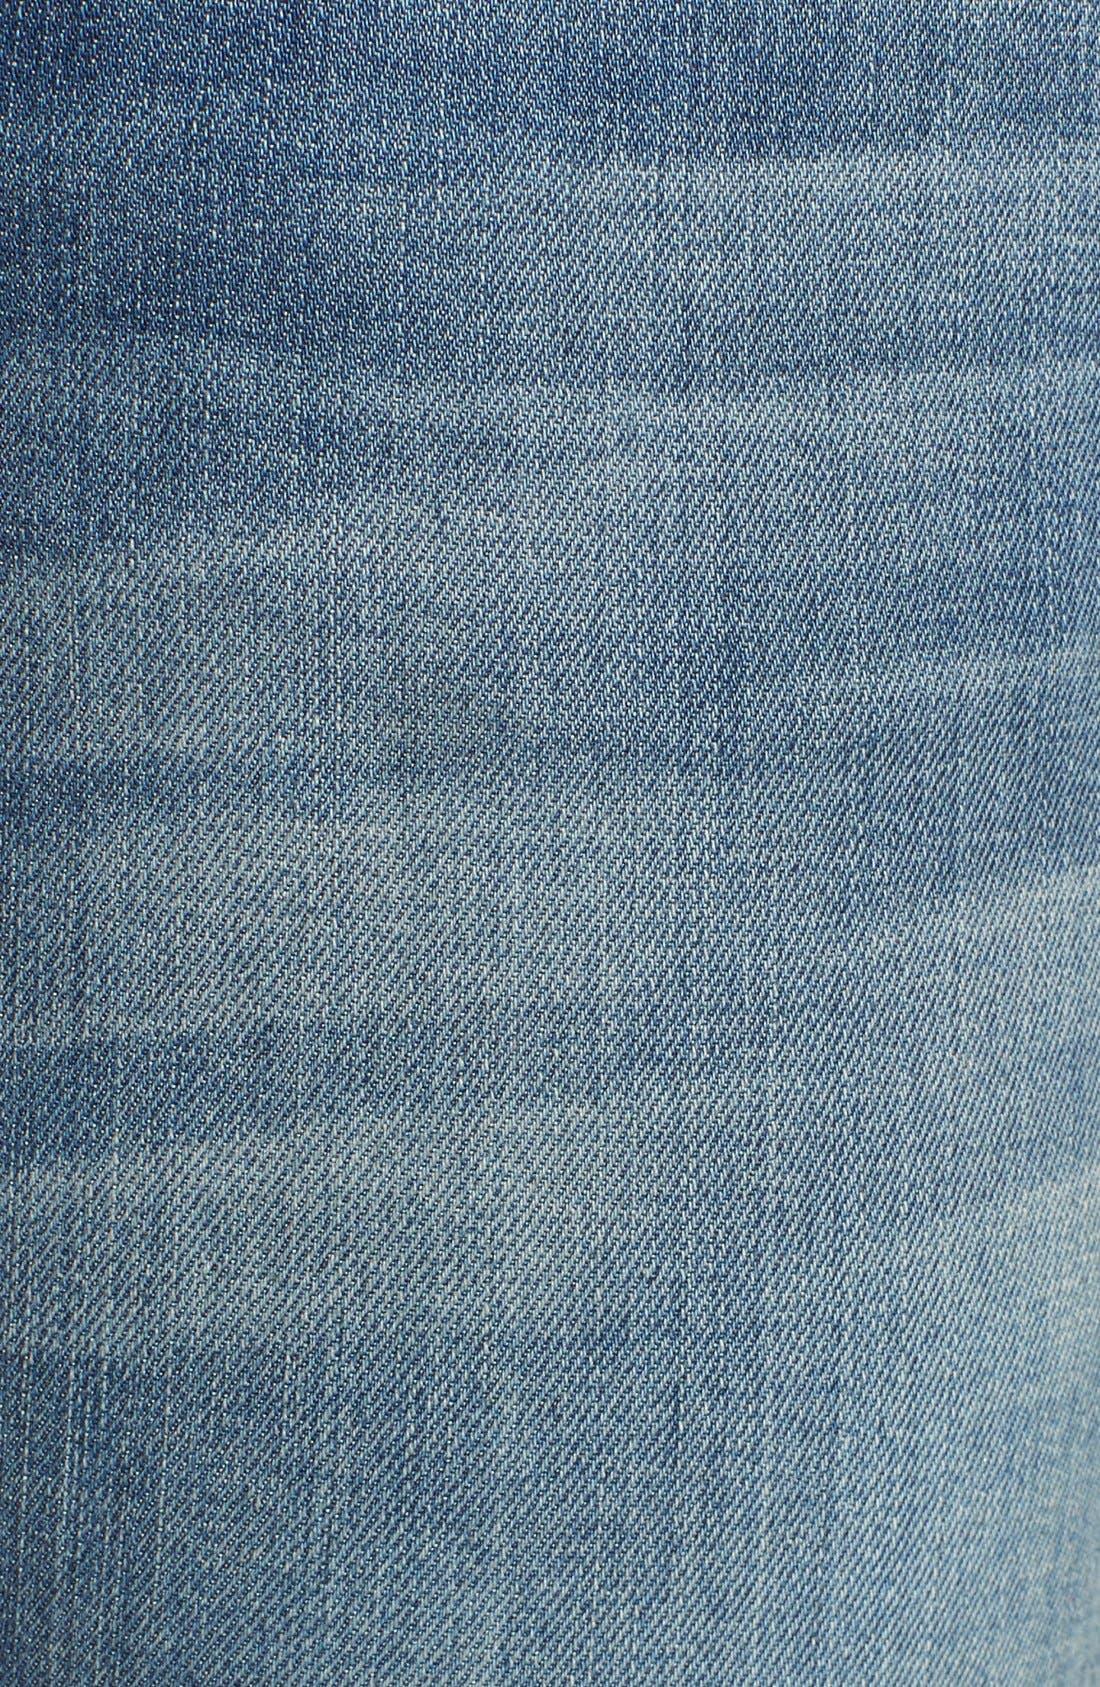 REBECCA MINKOFF, 'Jane' Skinny Jeans, Alternate thumbnail 4, color, 400